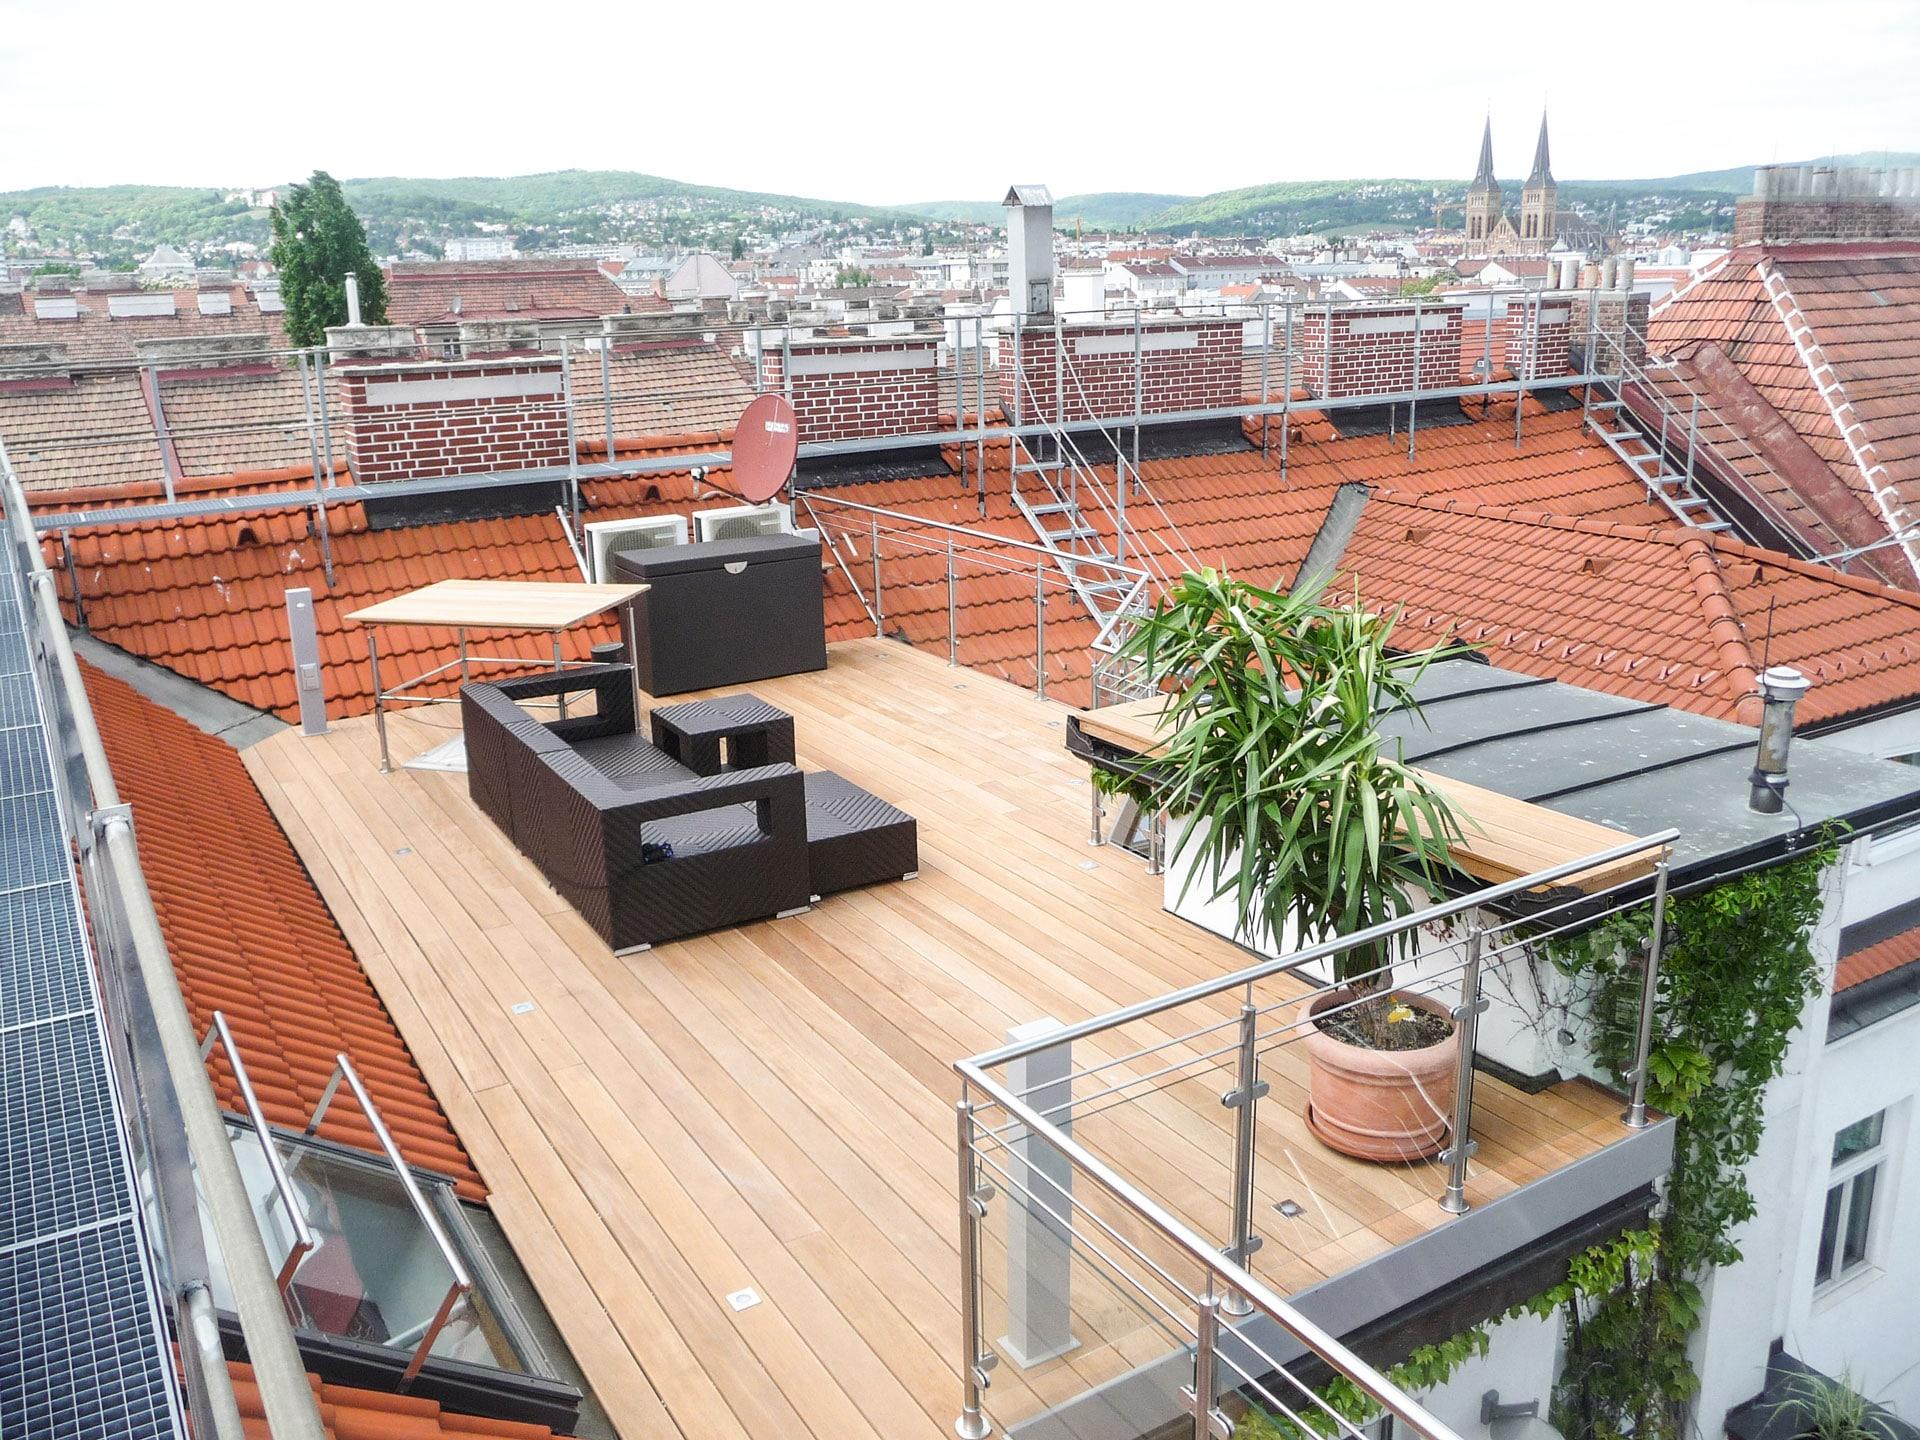 B Holz 05 b   hellbrauner Bangkirai Echtholz Terrassenboden auf Dachterrasse   Svoboda Metalltechnik